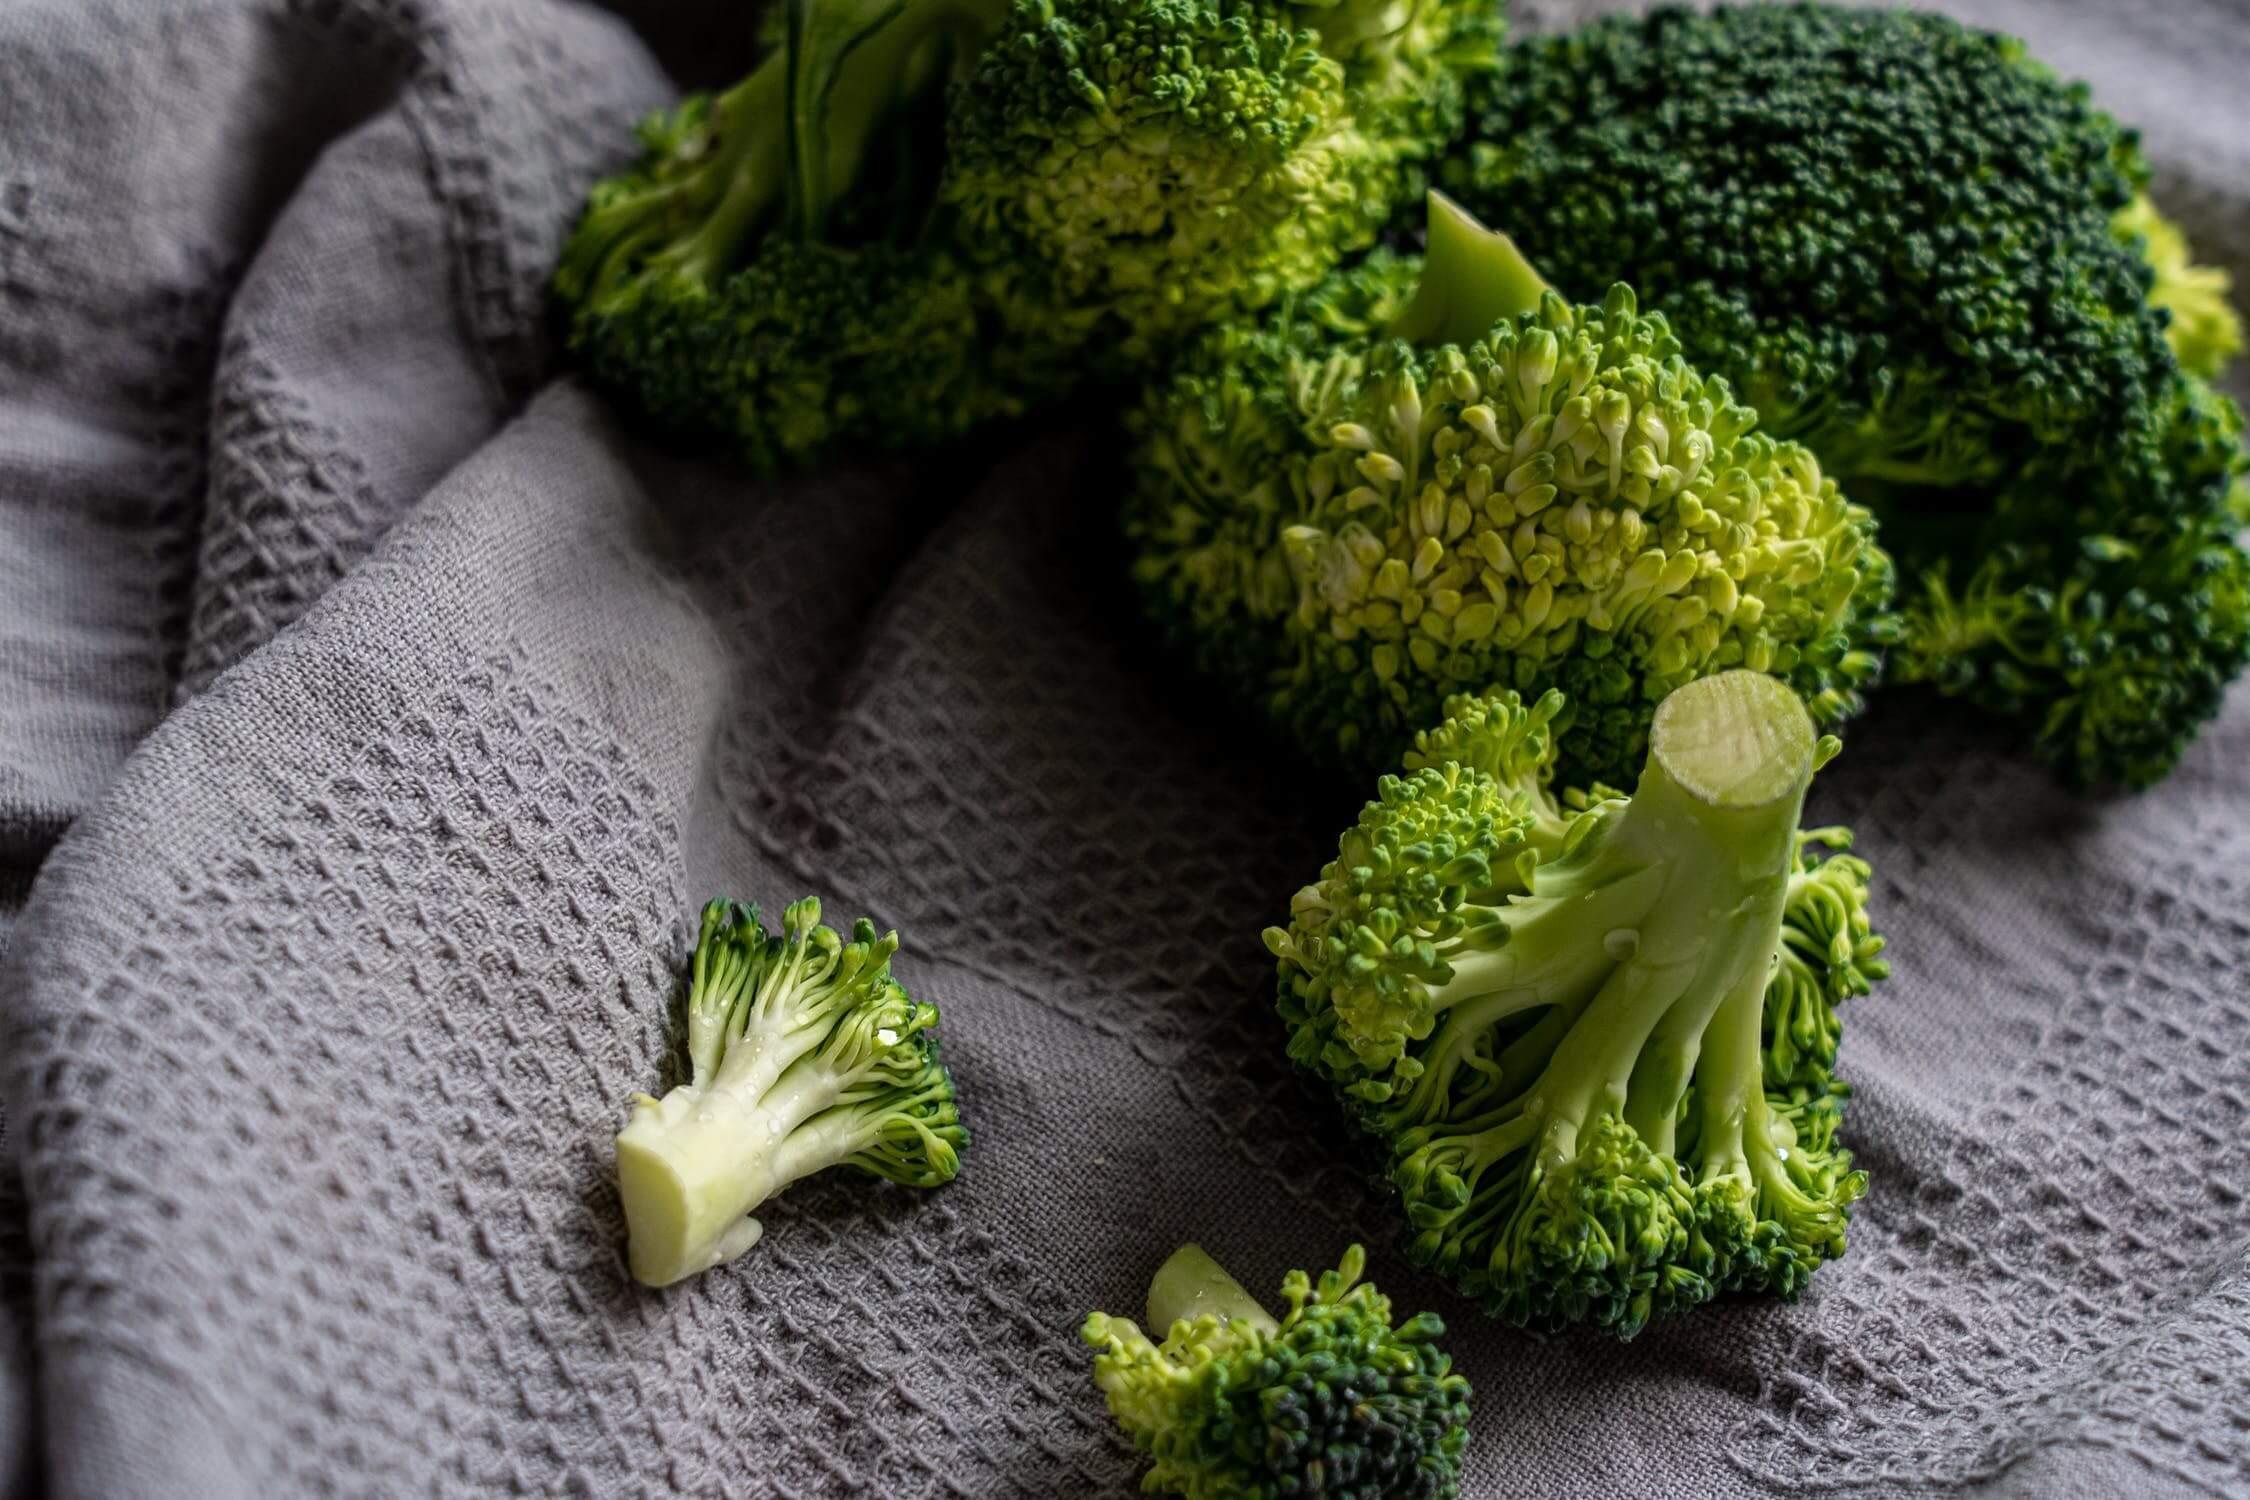 Fresh broccoli florets on a towel. Broccoli is a great brain health food